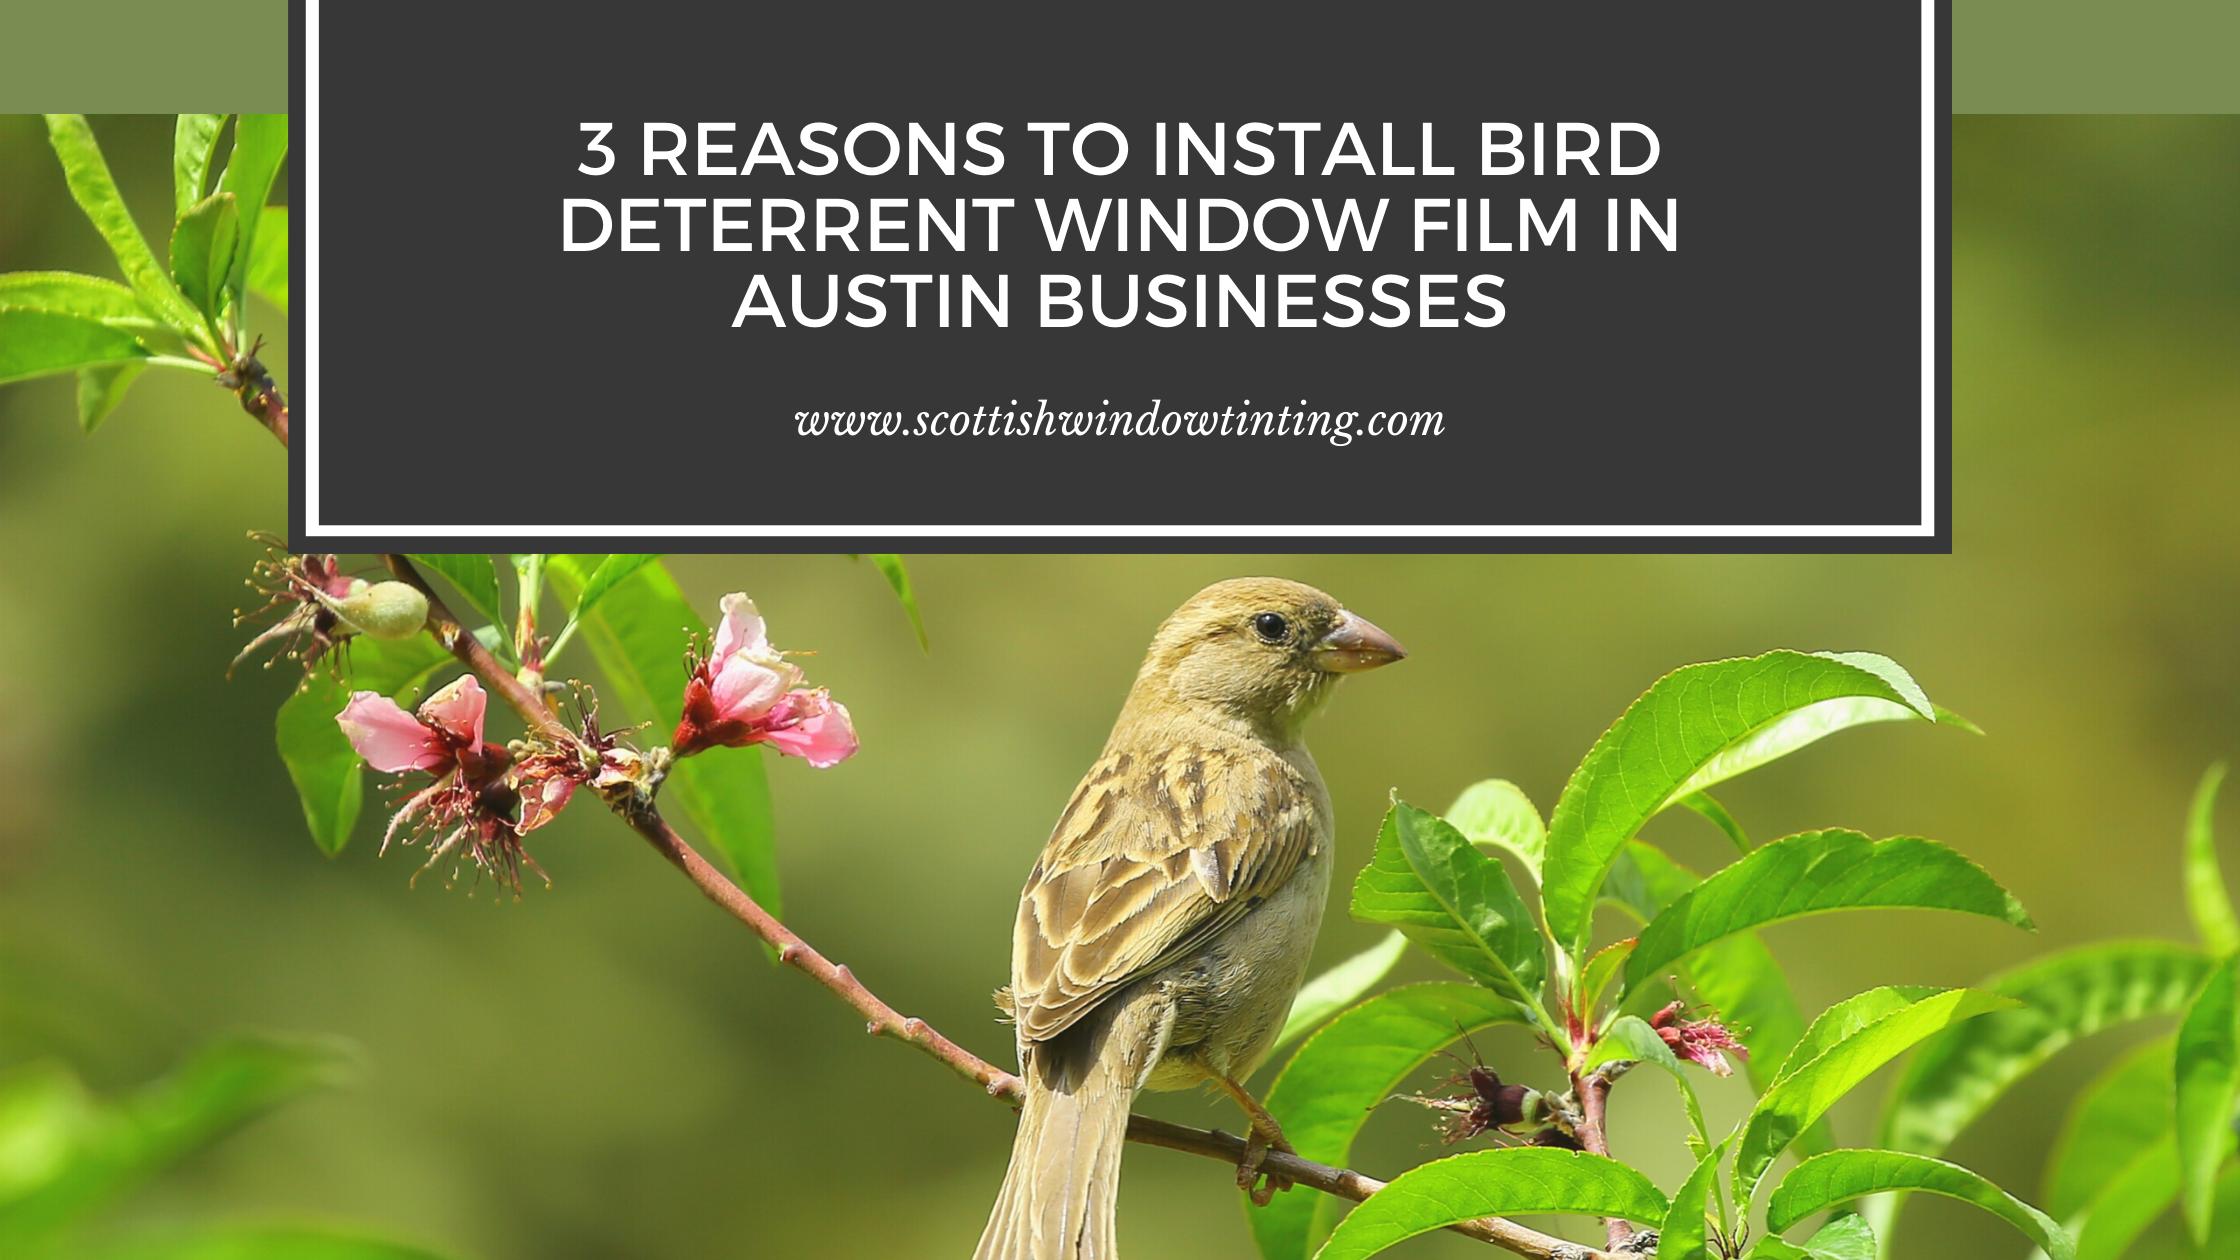 3 Reasons to Install Bird Deterrent Window Film in Austin Businesses